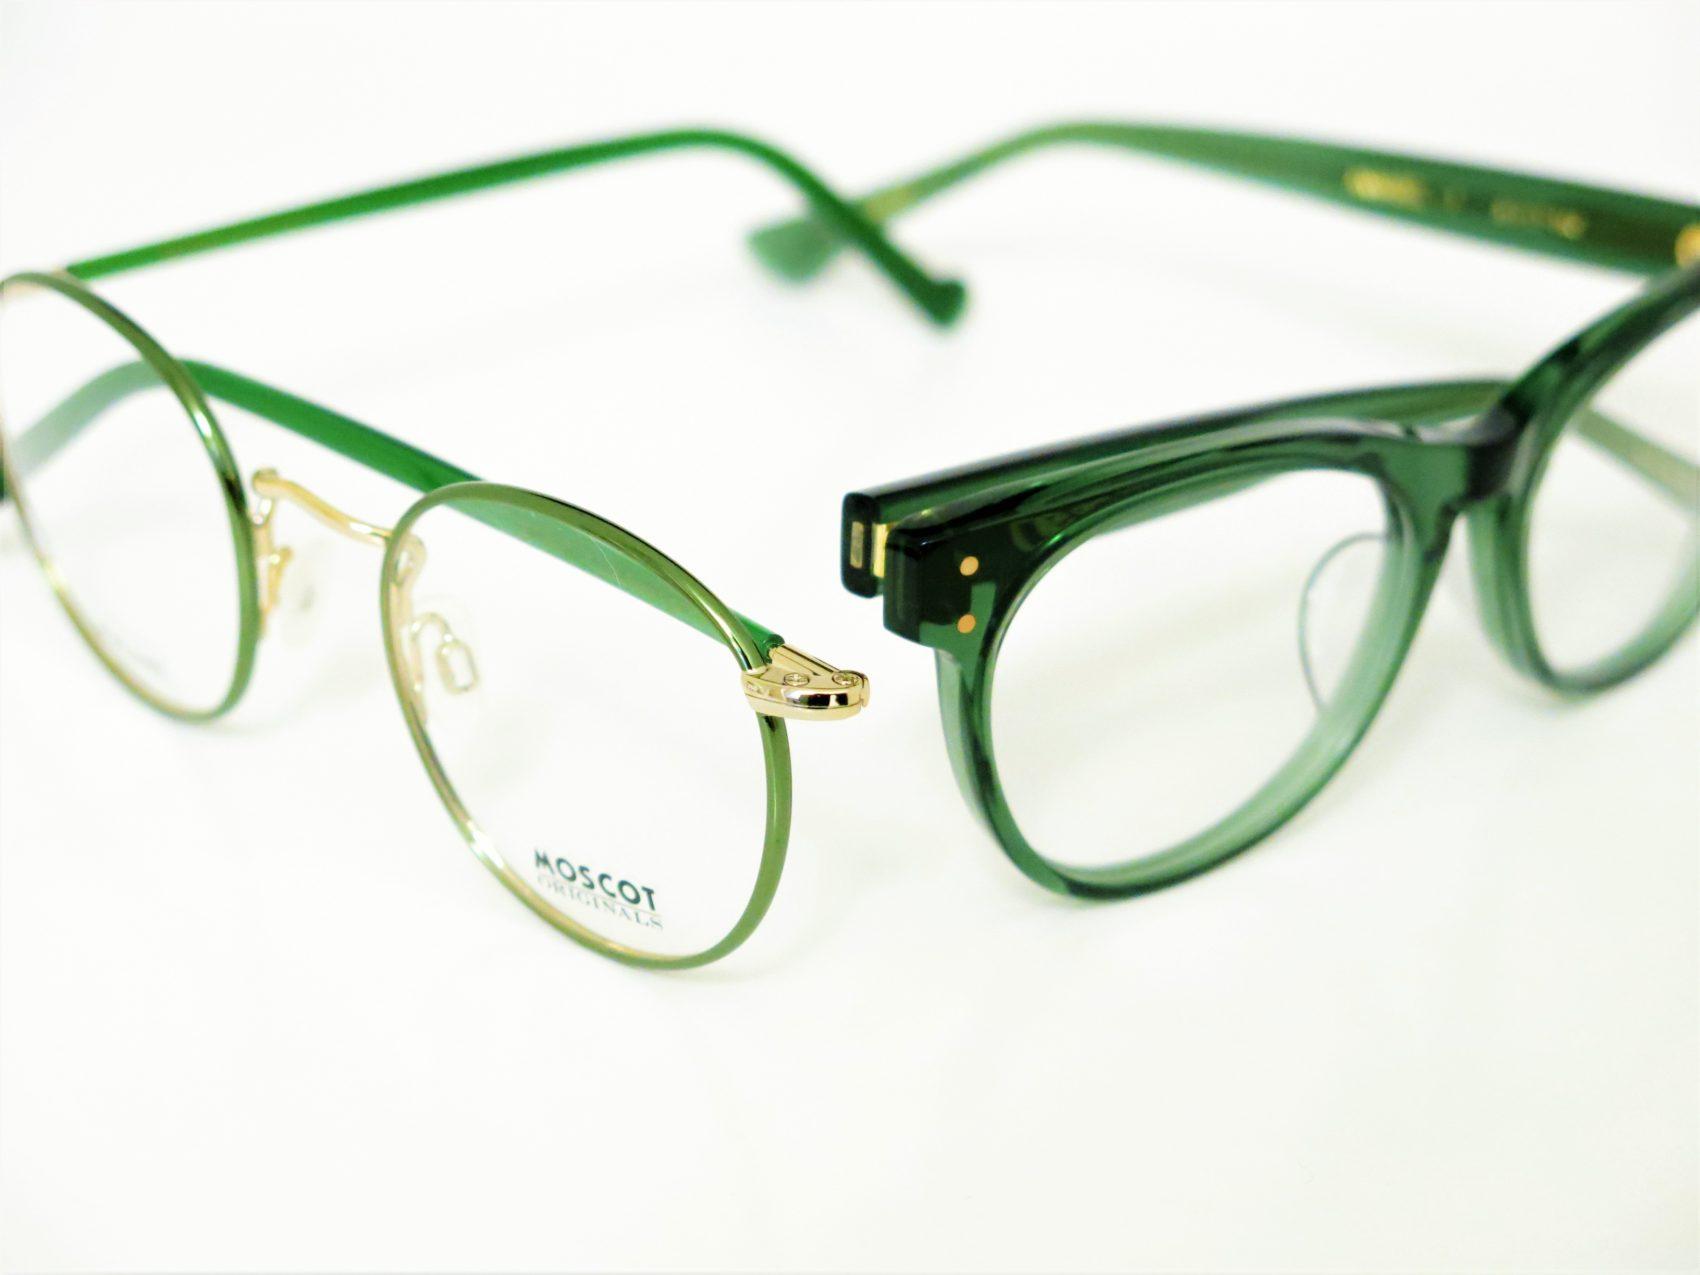 161107-green-1